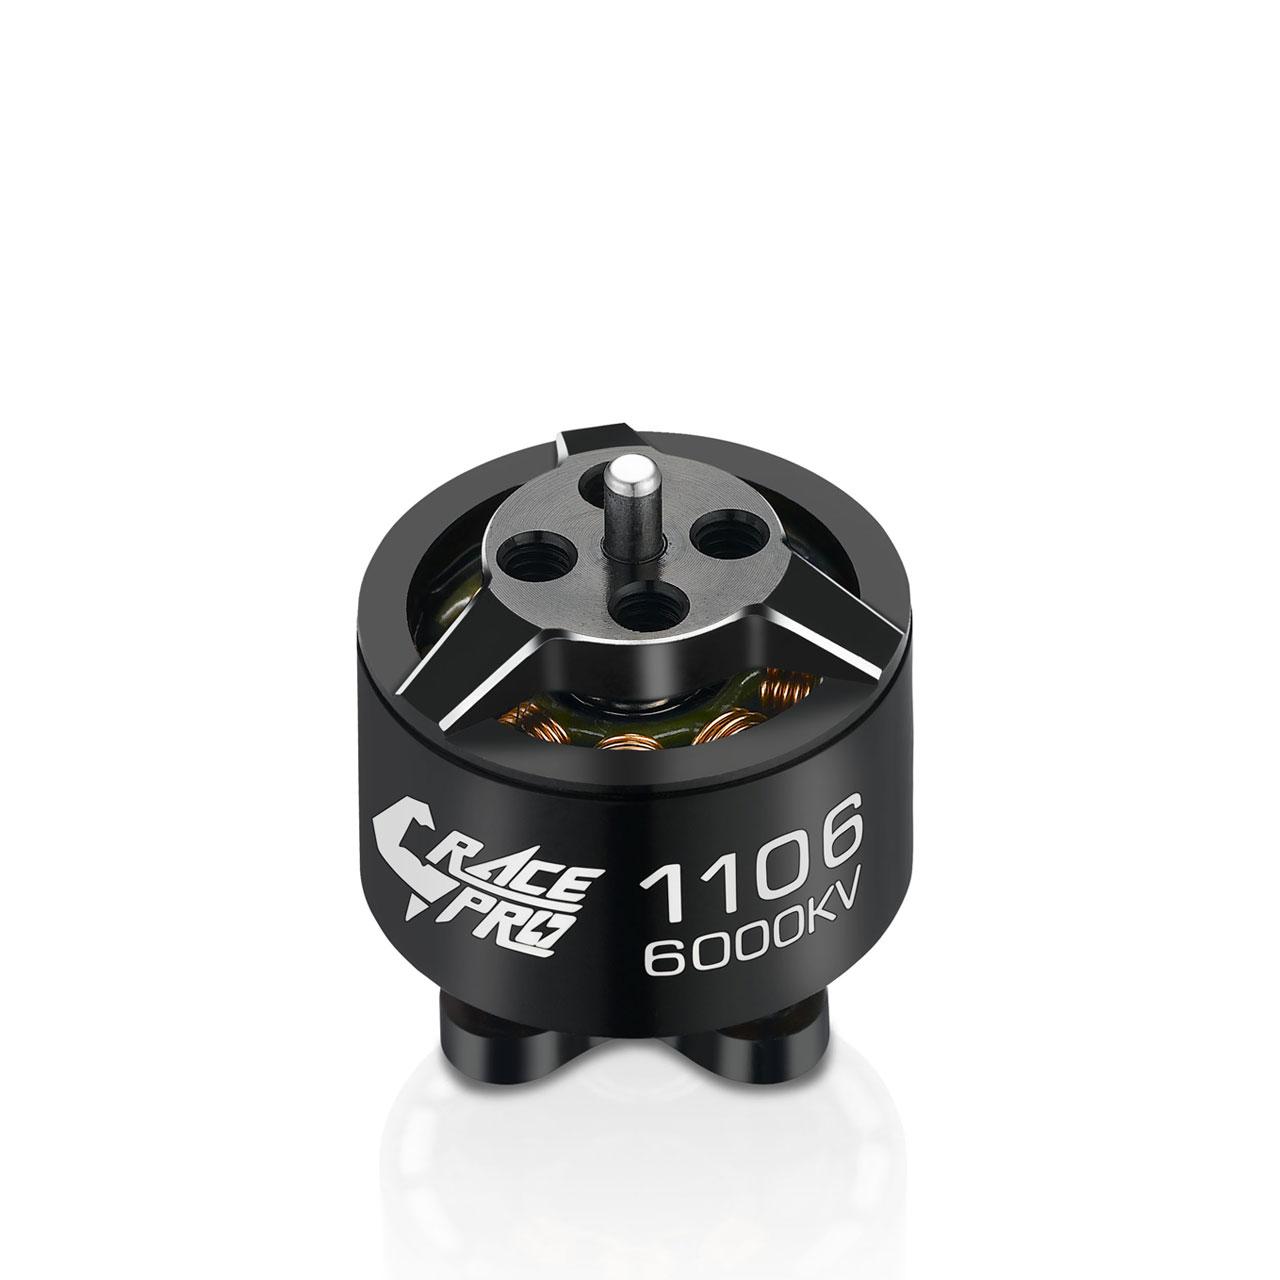 Hobbywing - XRotor 1106-6000KV Race Pro - 1-3S